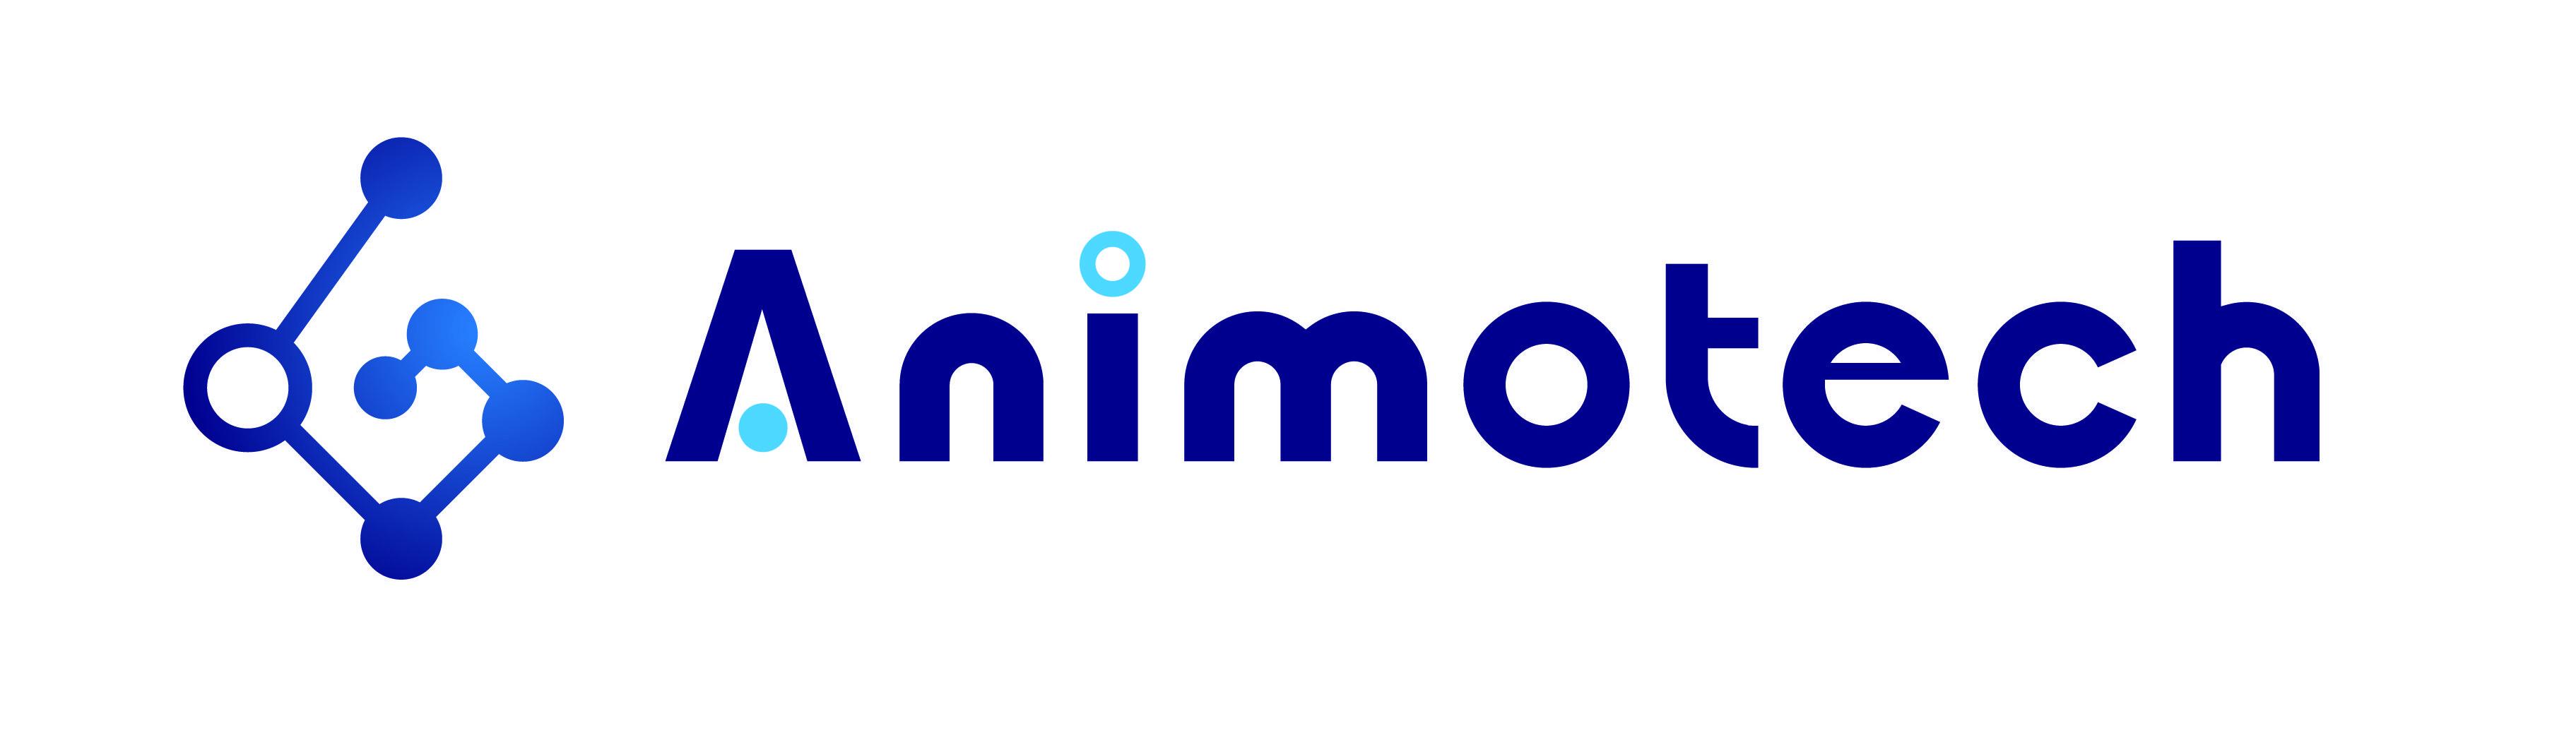 IoT・センシング機器の受託開発-アニモテック株式会社